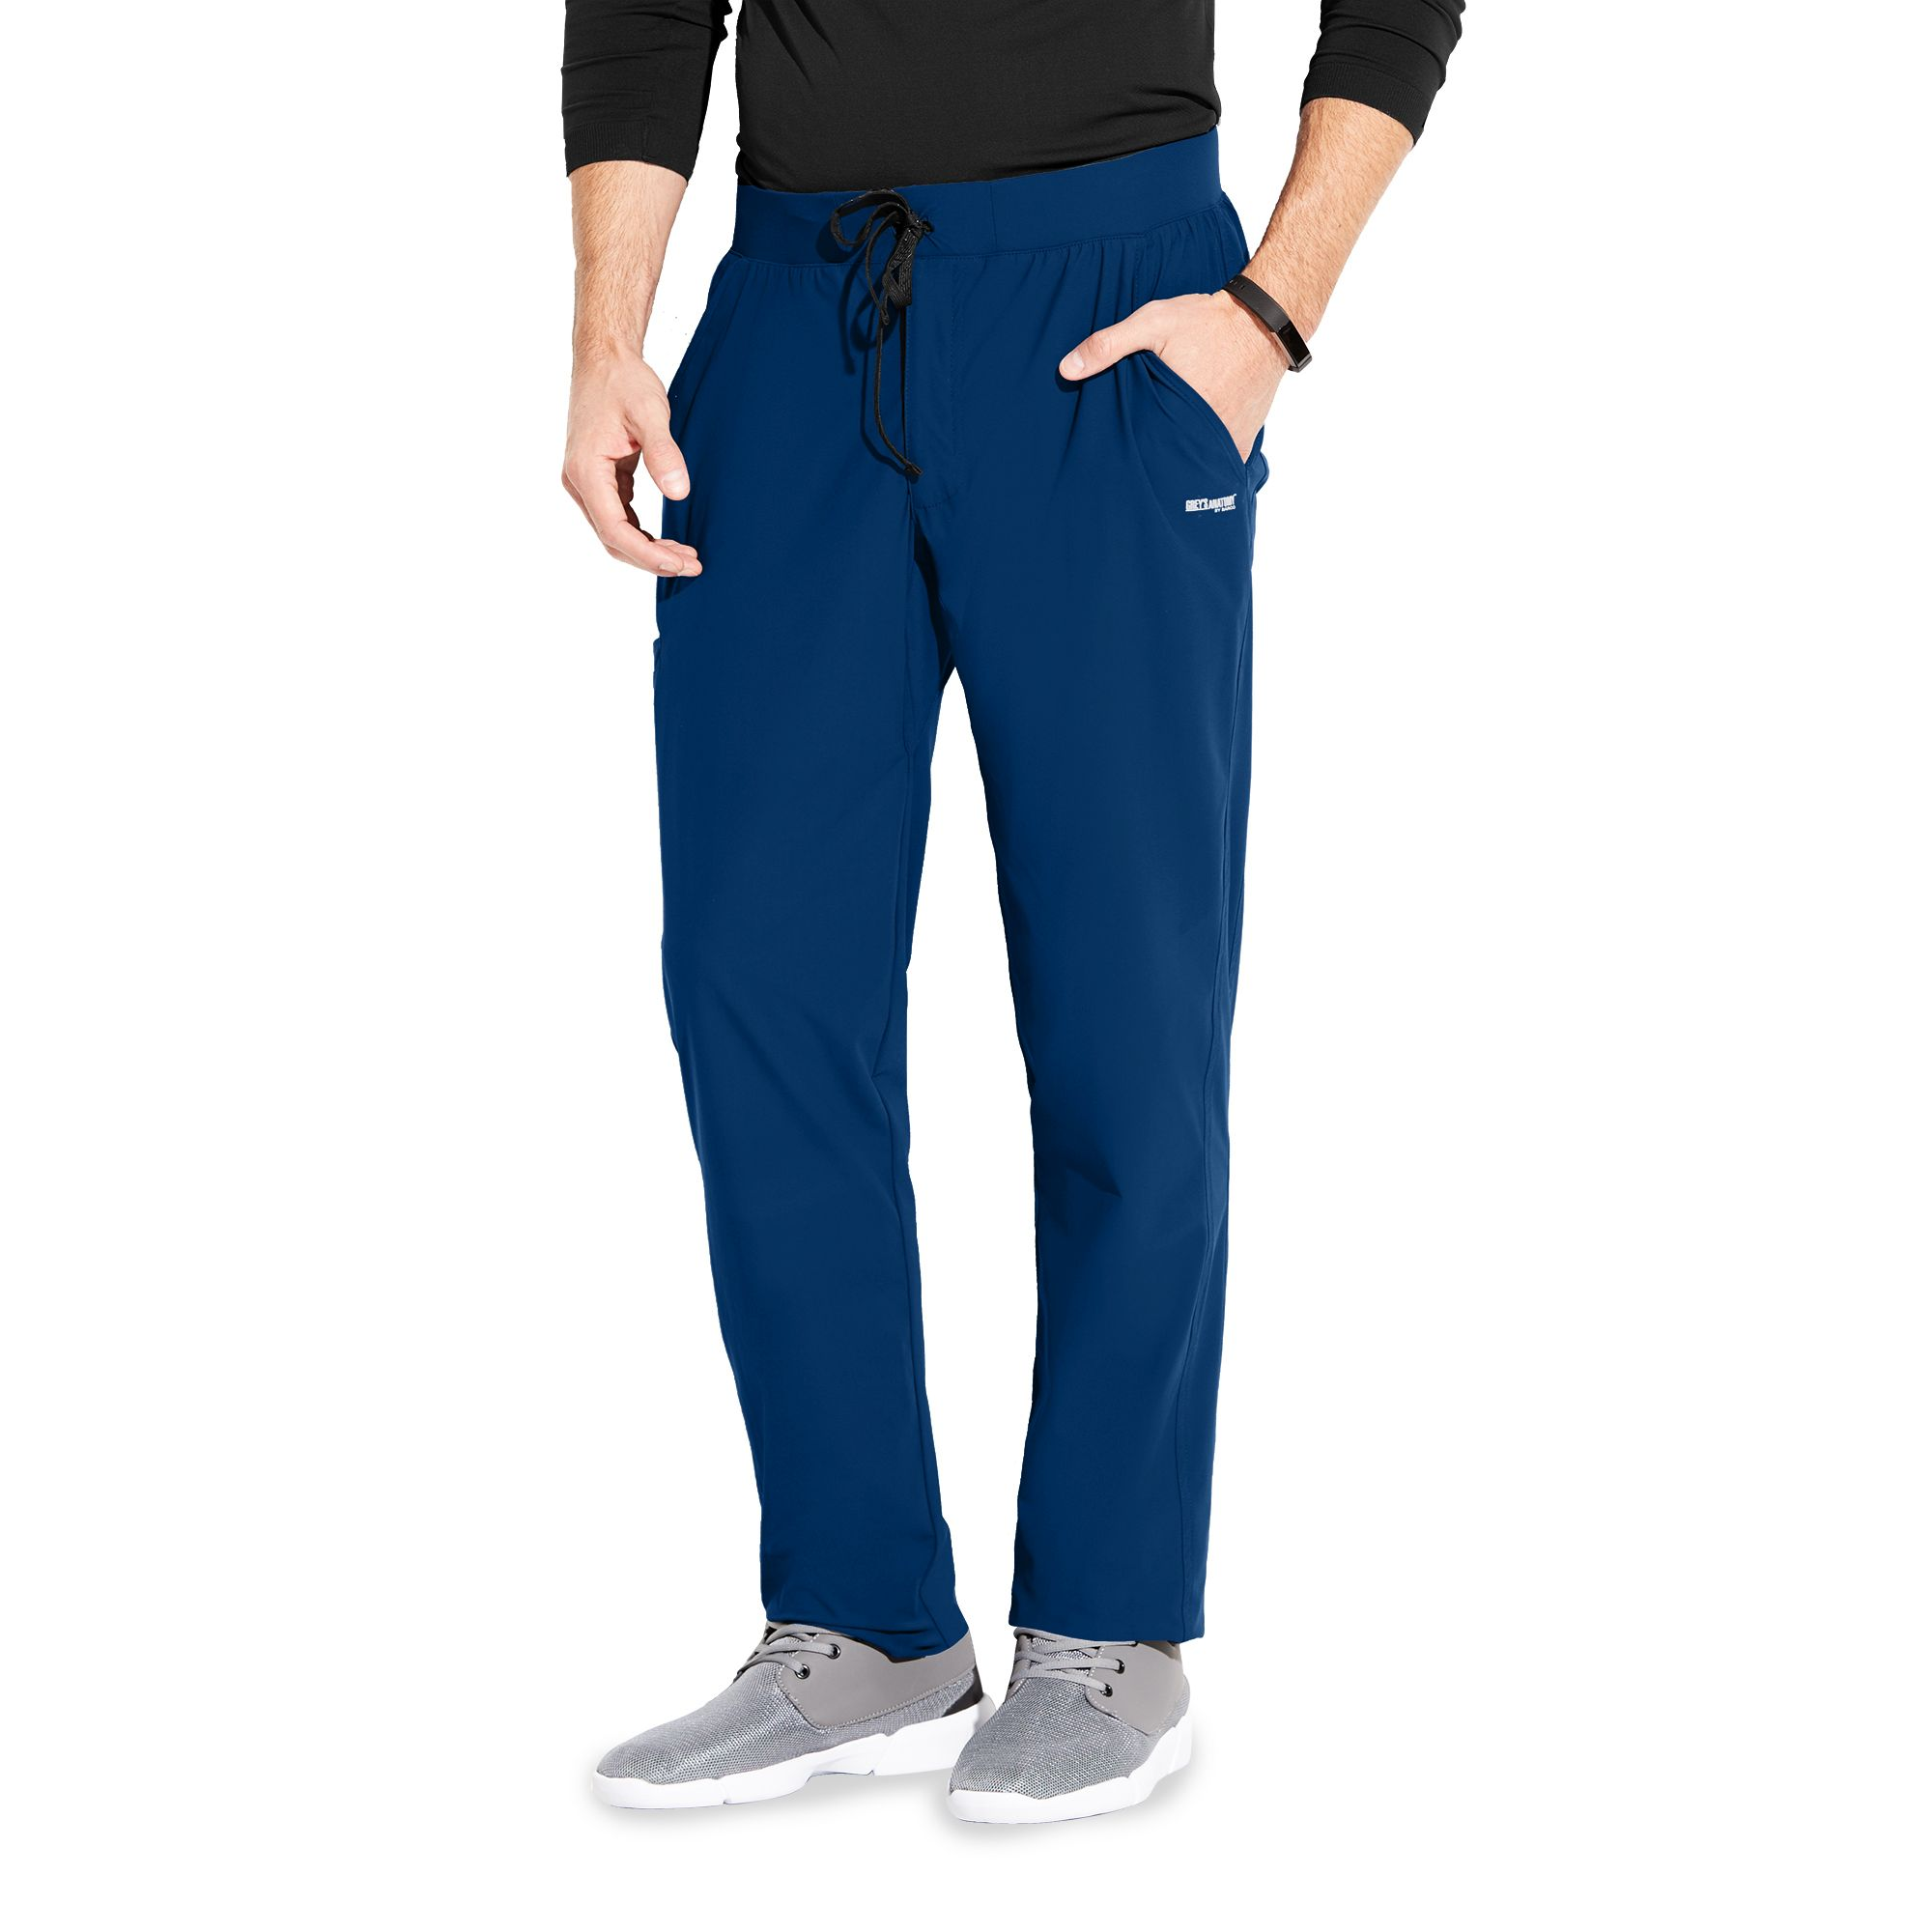 EDGE - NEW Men's 4 Pocket Gusset Pant-Greys Anatomy Edge